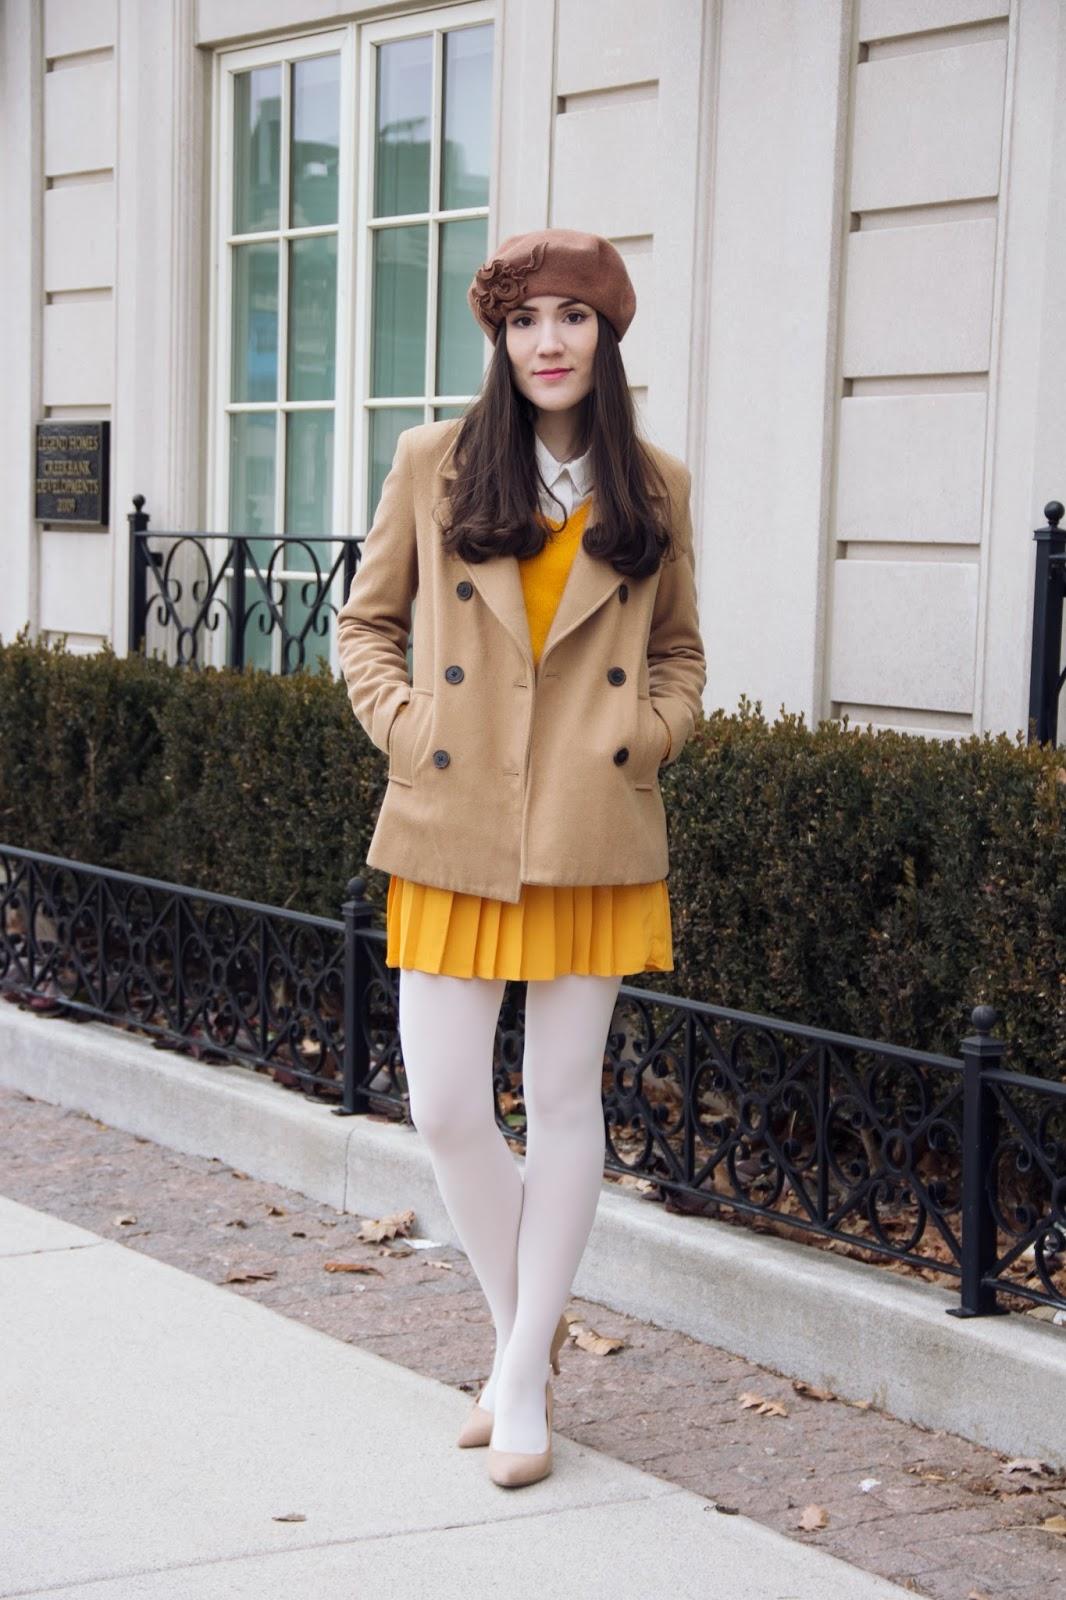 Mustard Yellow : Two ways to wear it !